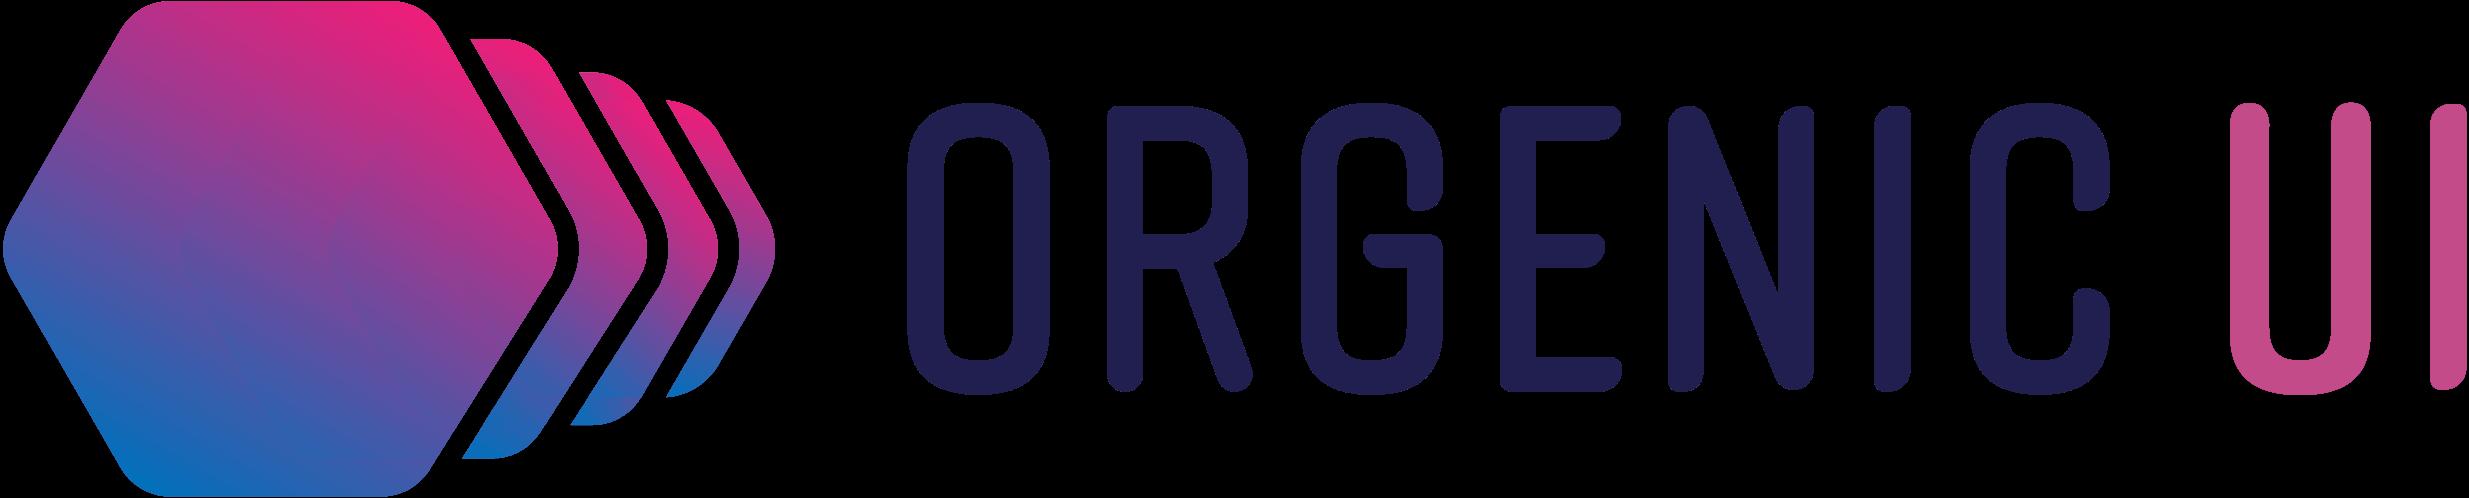 ORGENIC.ORG